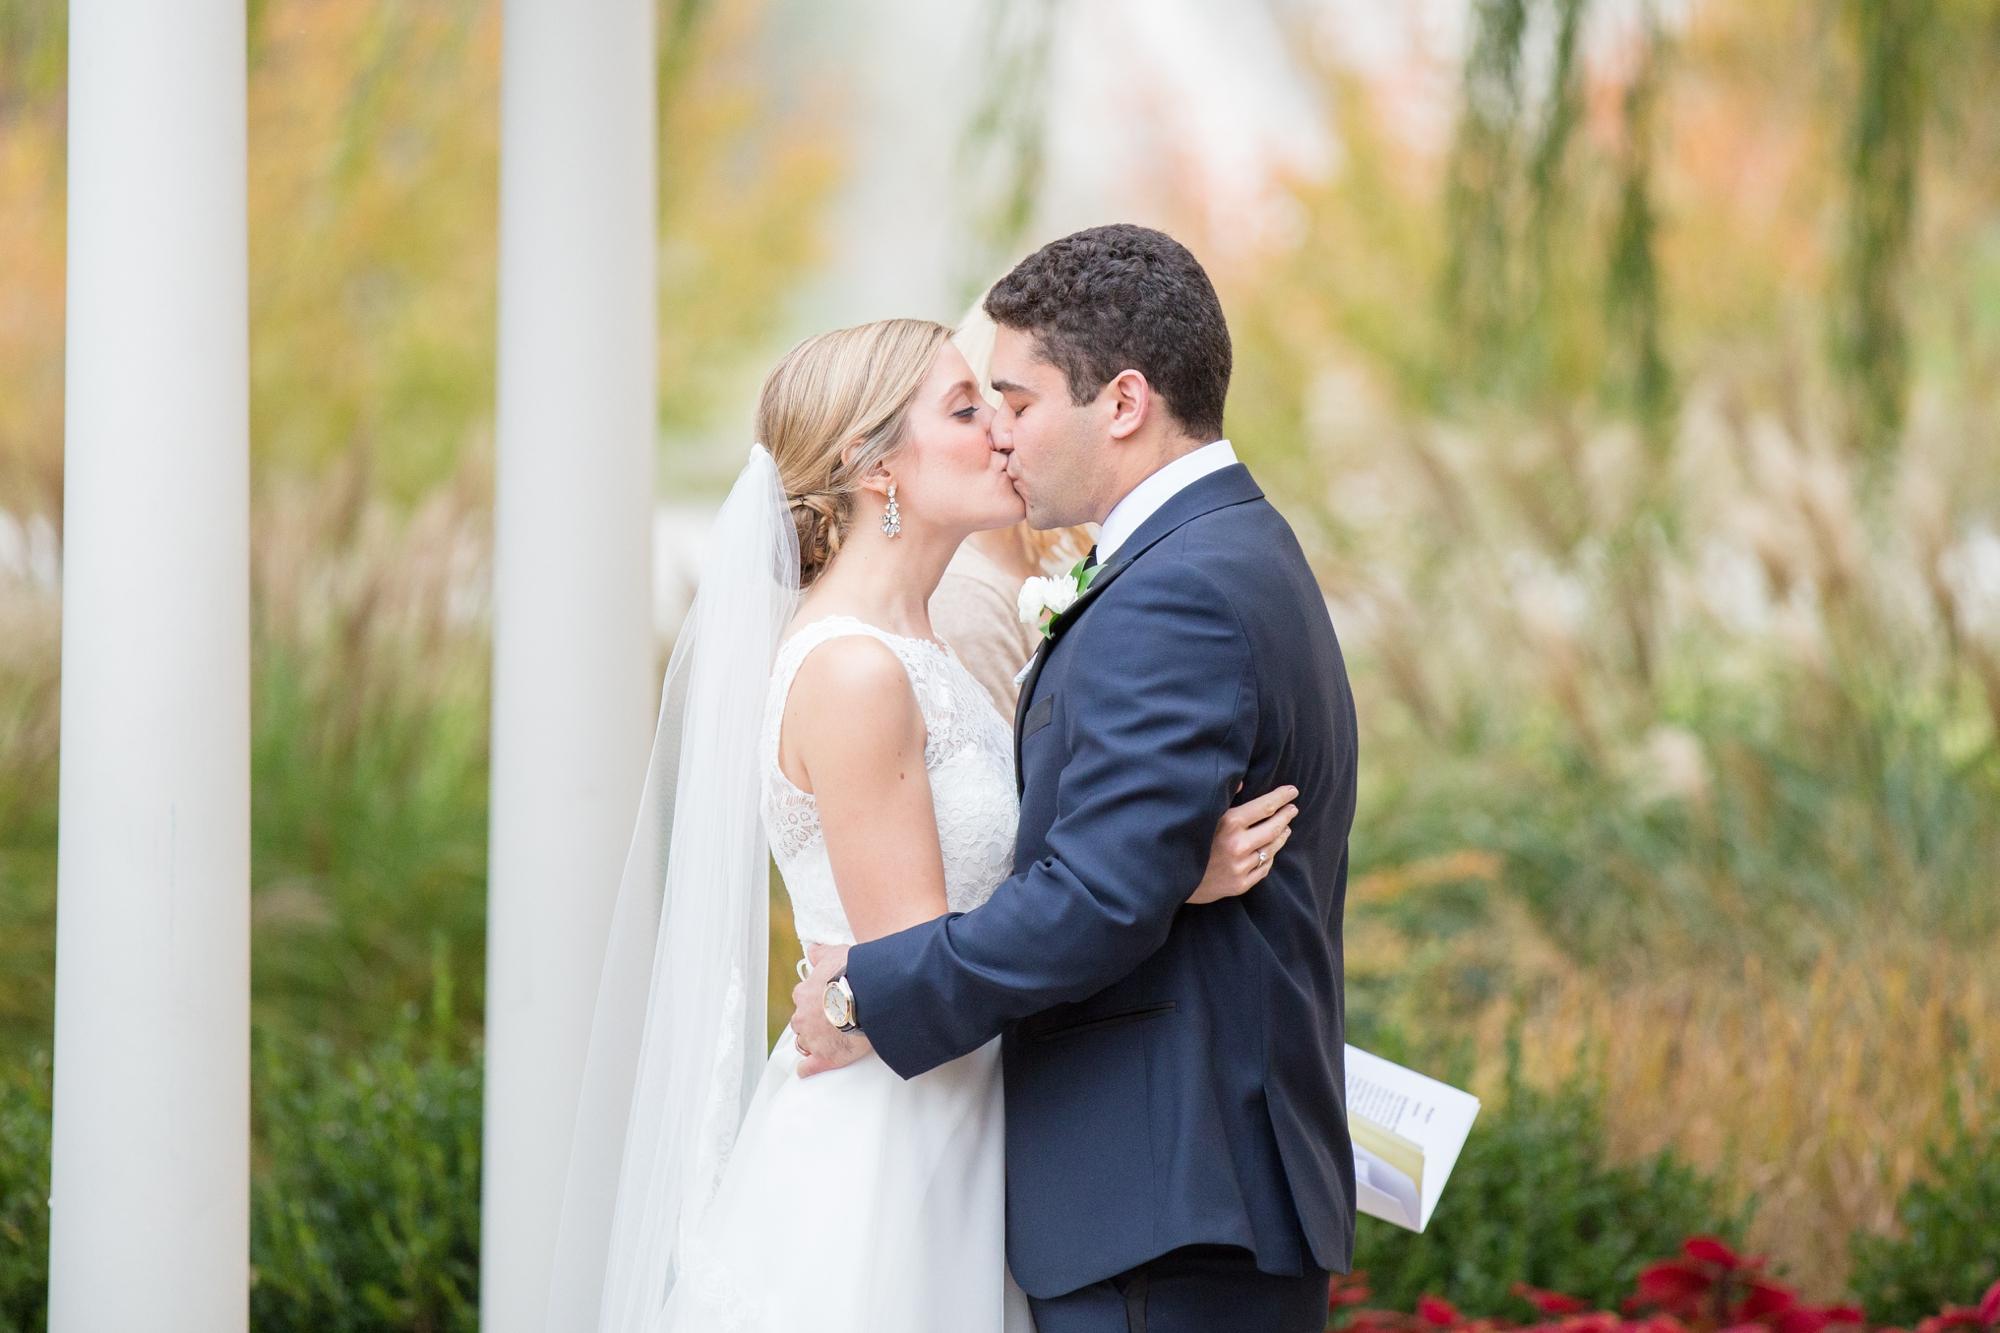 5-Finkel Wedding Ceremony-679_anna grace photography maryland wedding photographer turf valley.jpg